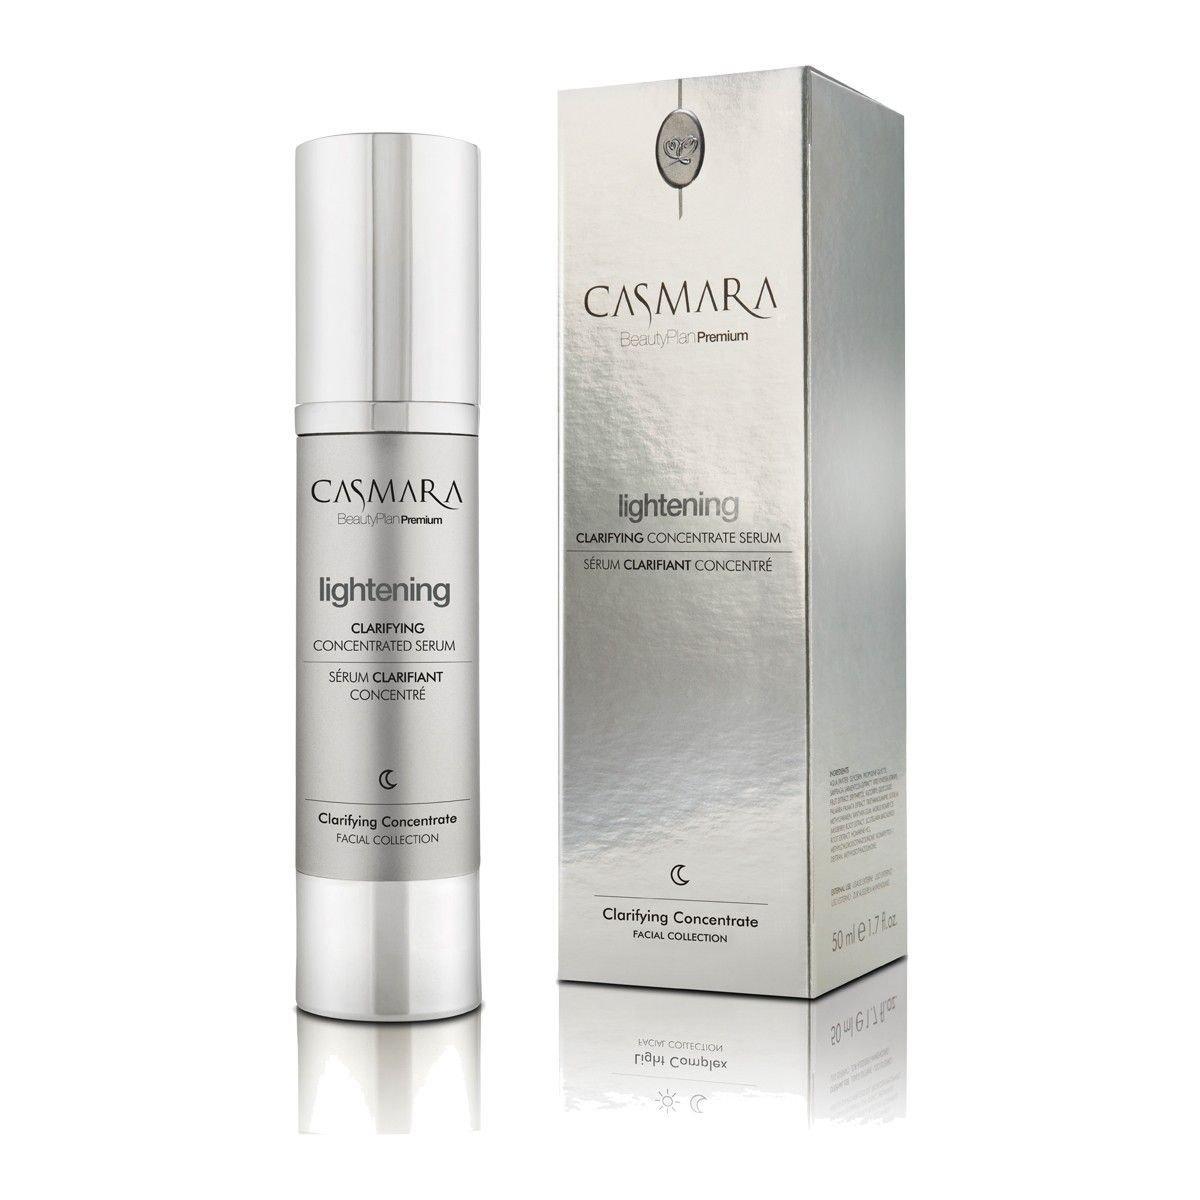 Afbeelding van Casmara Clarifying Concentrate Serum 50Ml Lightening /